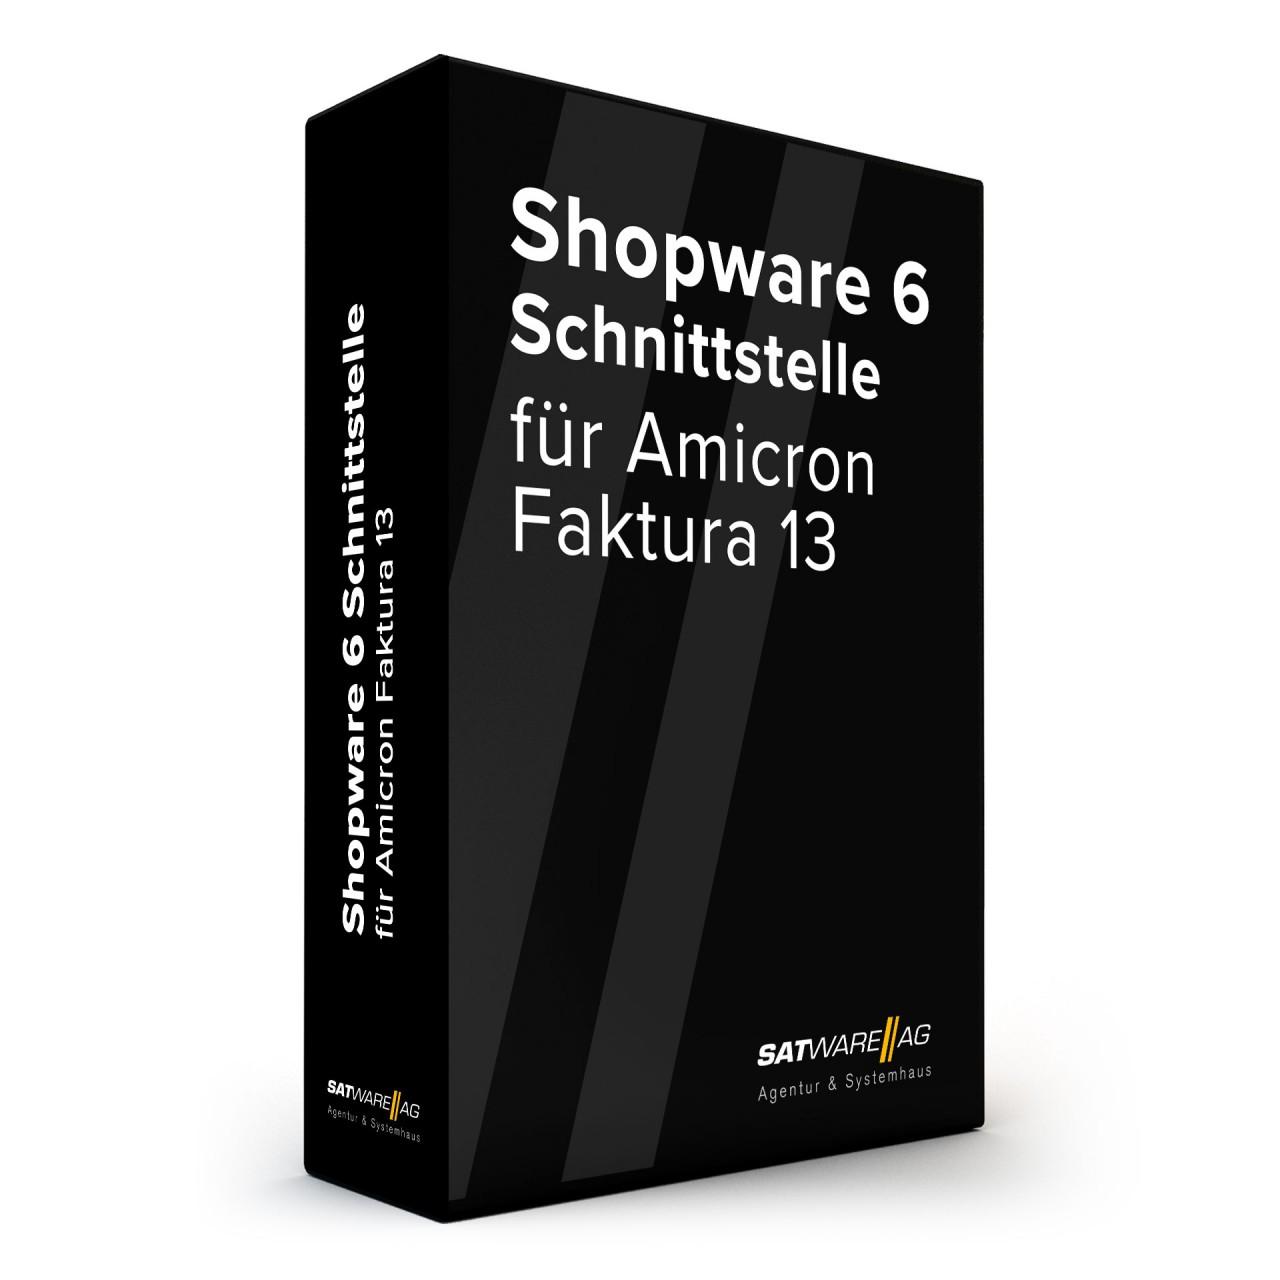 Shopware-6-Schnittstelle-fuer-Amicron-Faktura-13